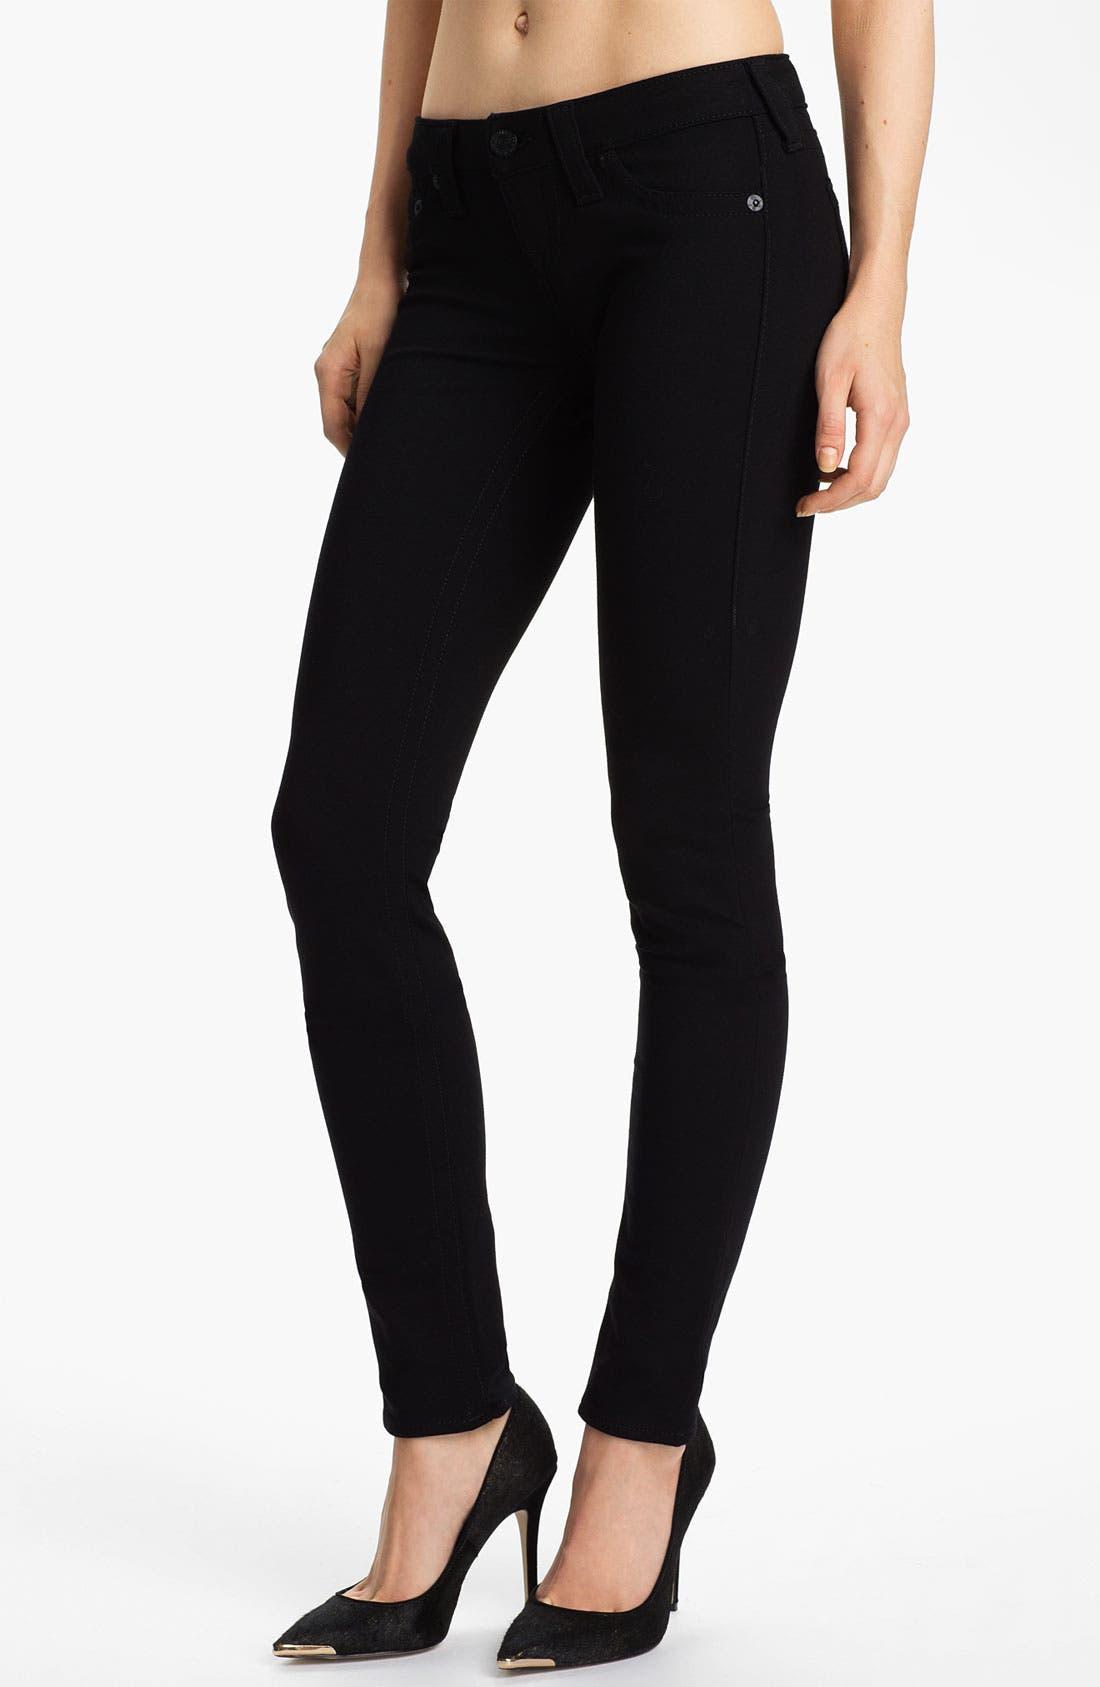 Alternate Image 1 Selected - True Religion Brand Jeans 'Stella' Stretch Ponte Knit Pants